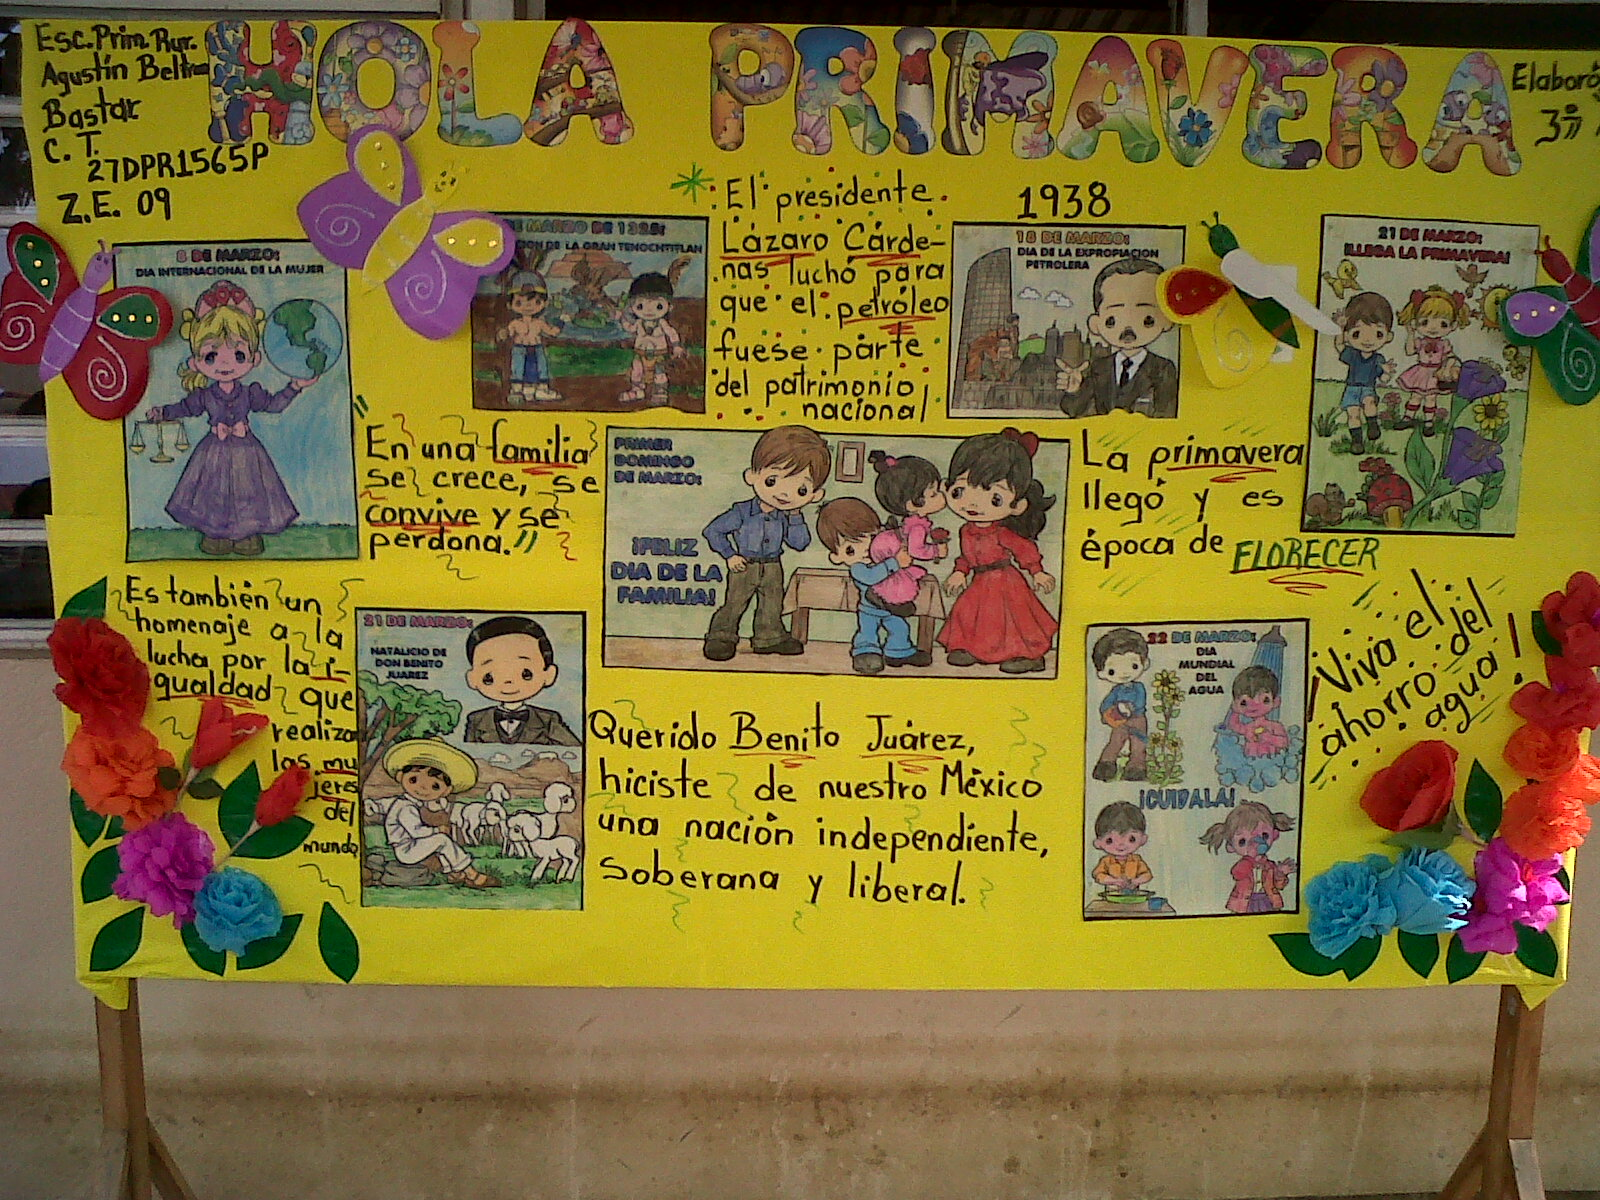 Periodico mural 6 imagenes educativas for Estructura del periodico mural